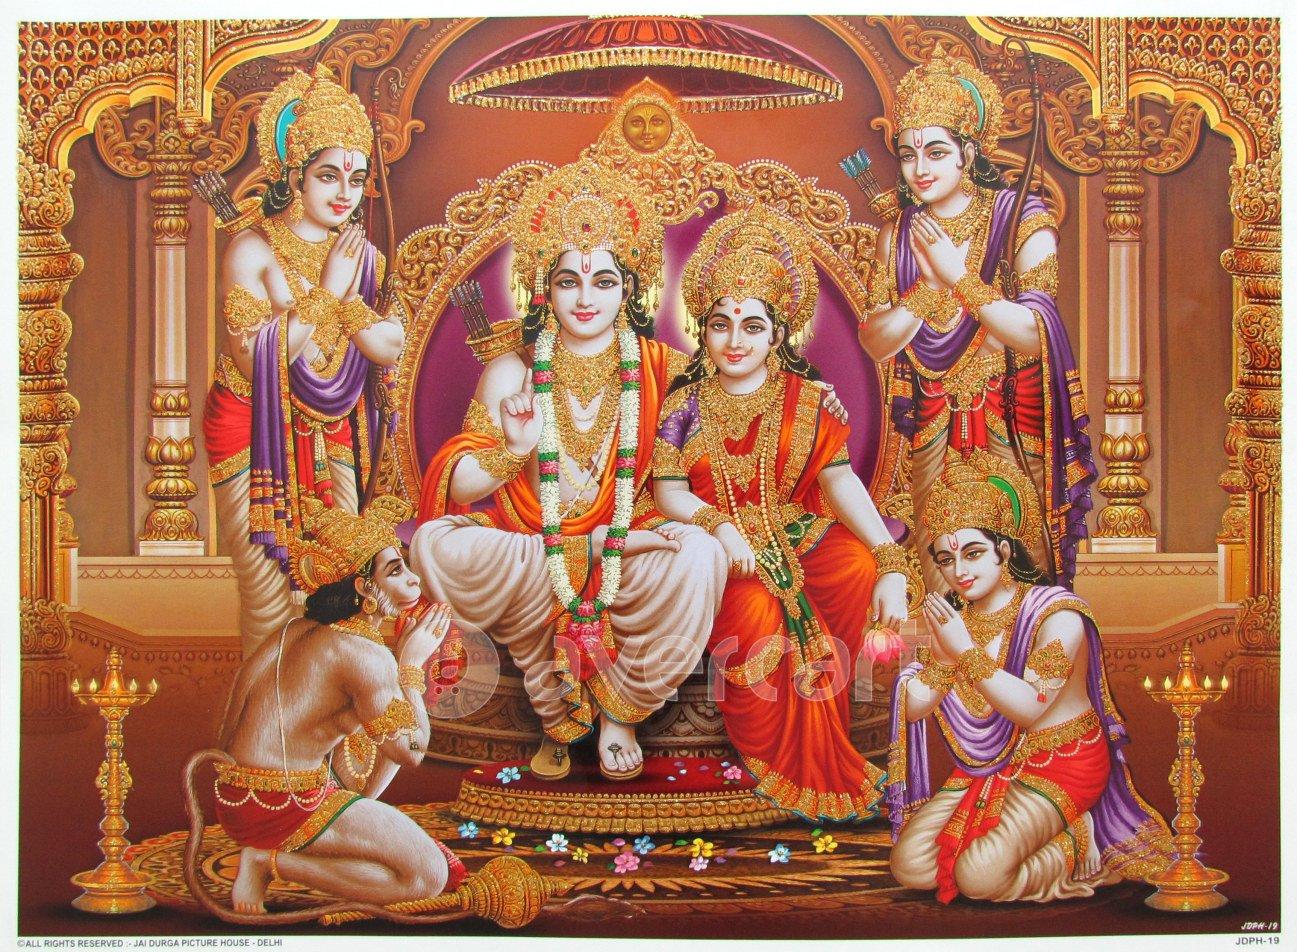 Simple Wallpaper Lord Ram Darbar - 81-0reXxuGL  Photograph_3039.jpg